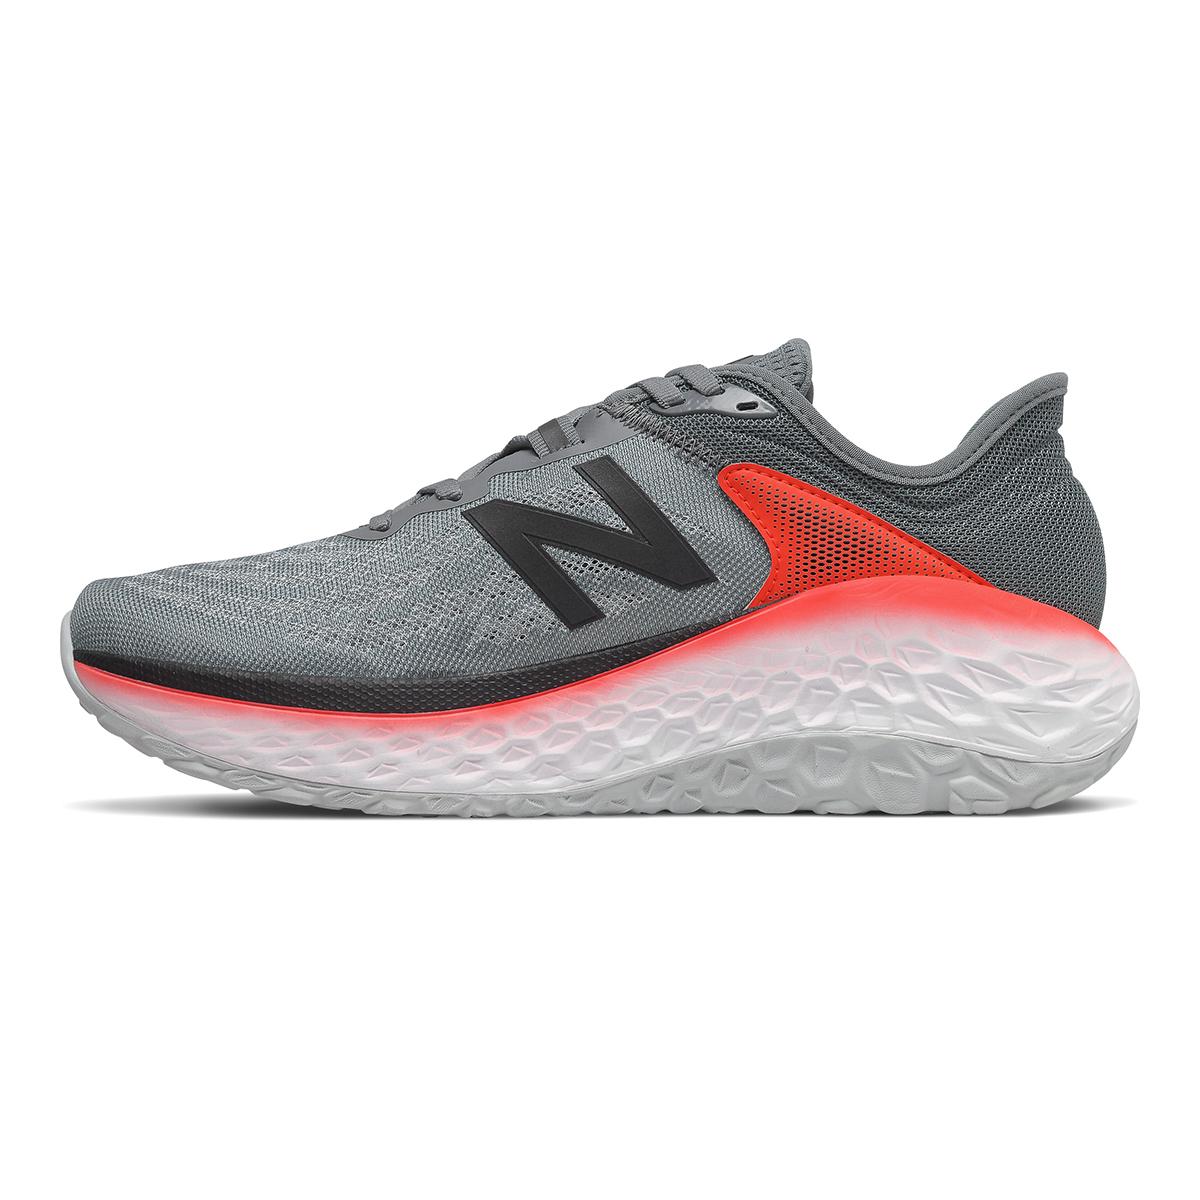 Men's New Balance Fresh Foam More V2 Running Shoe - Color: Gunmetal - Size: 7 - Width: Wide, Gunmetal, large, image 2